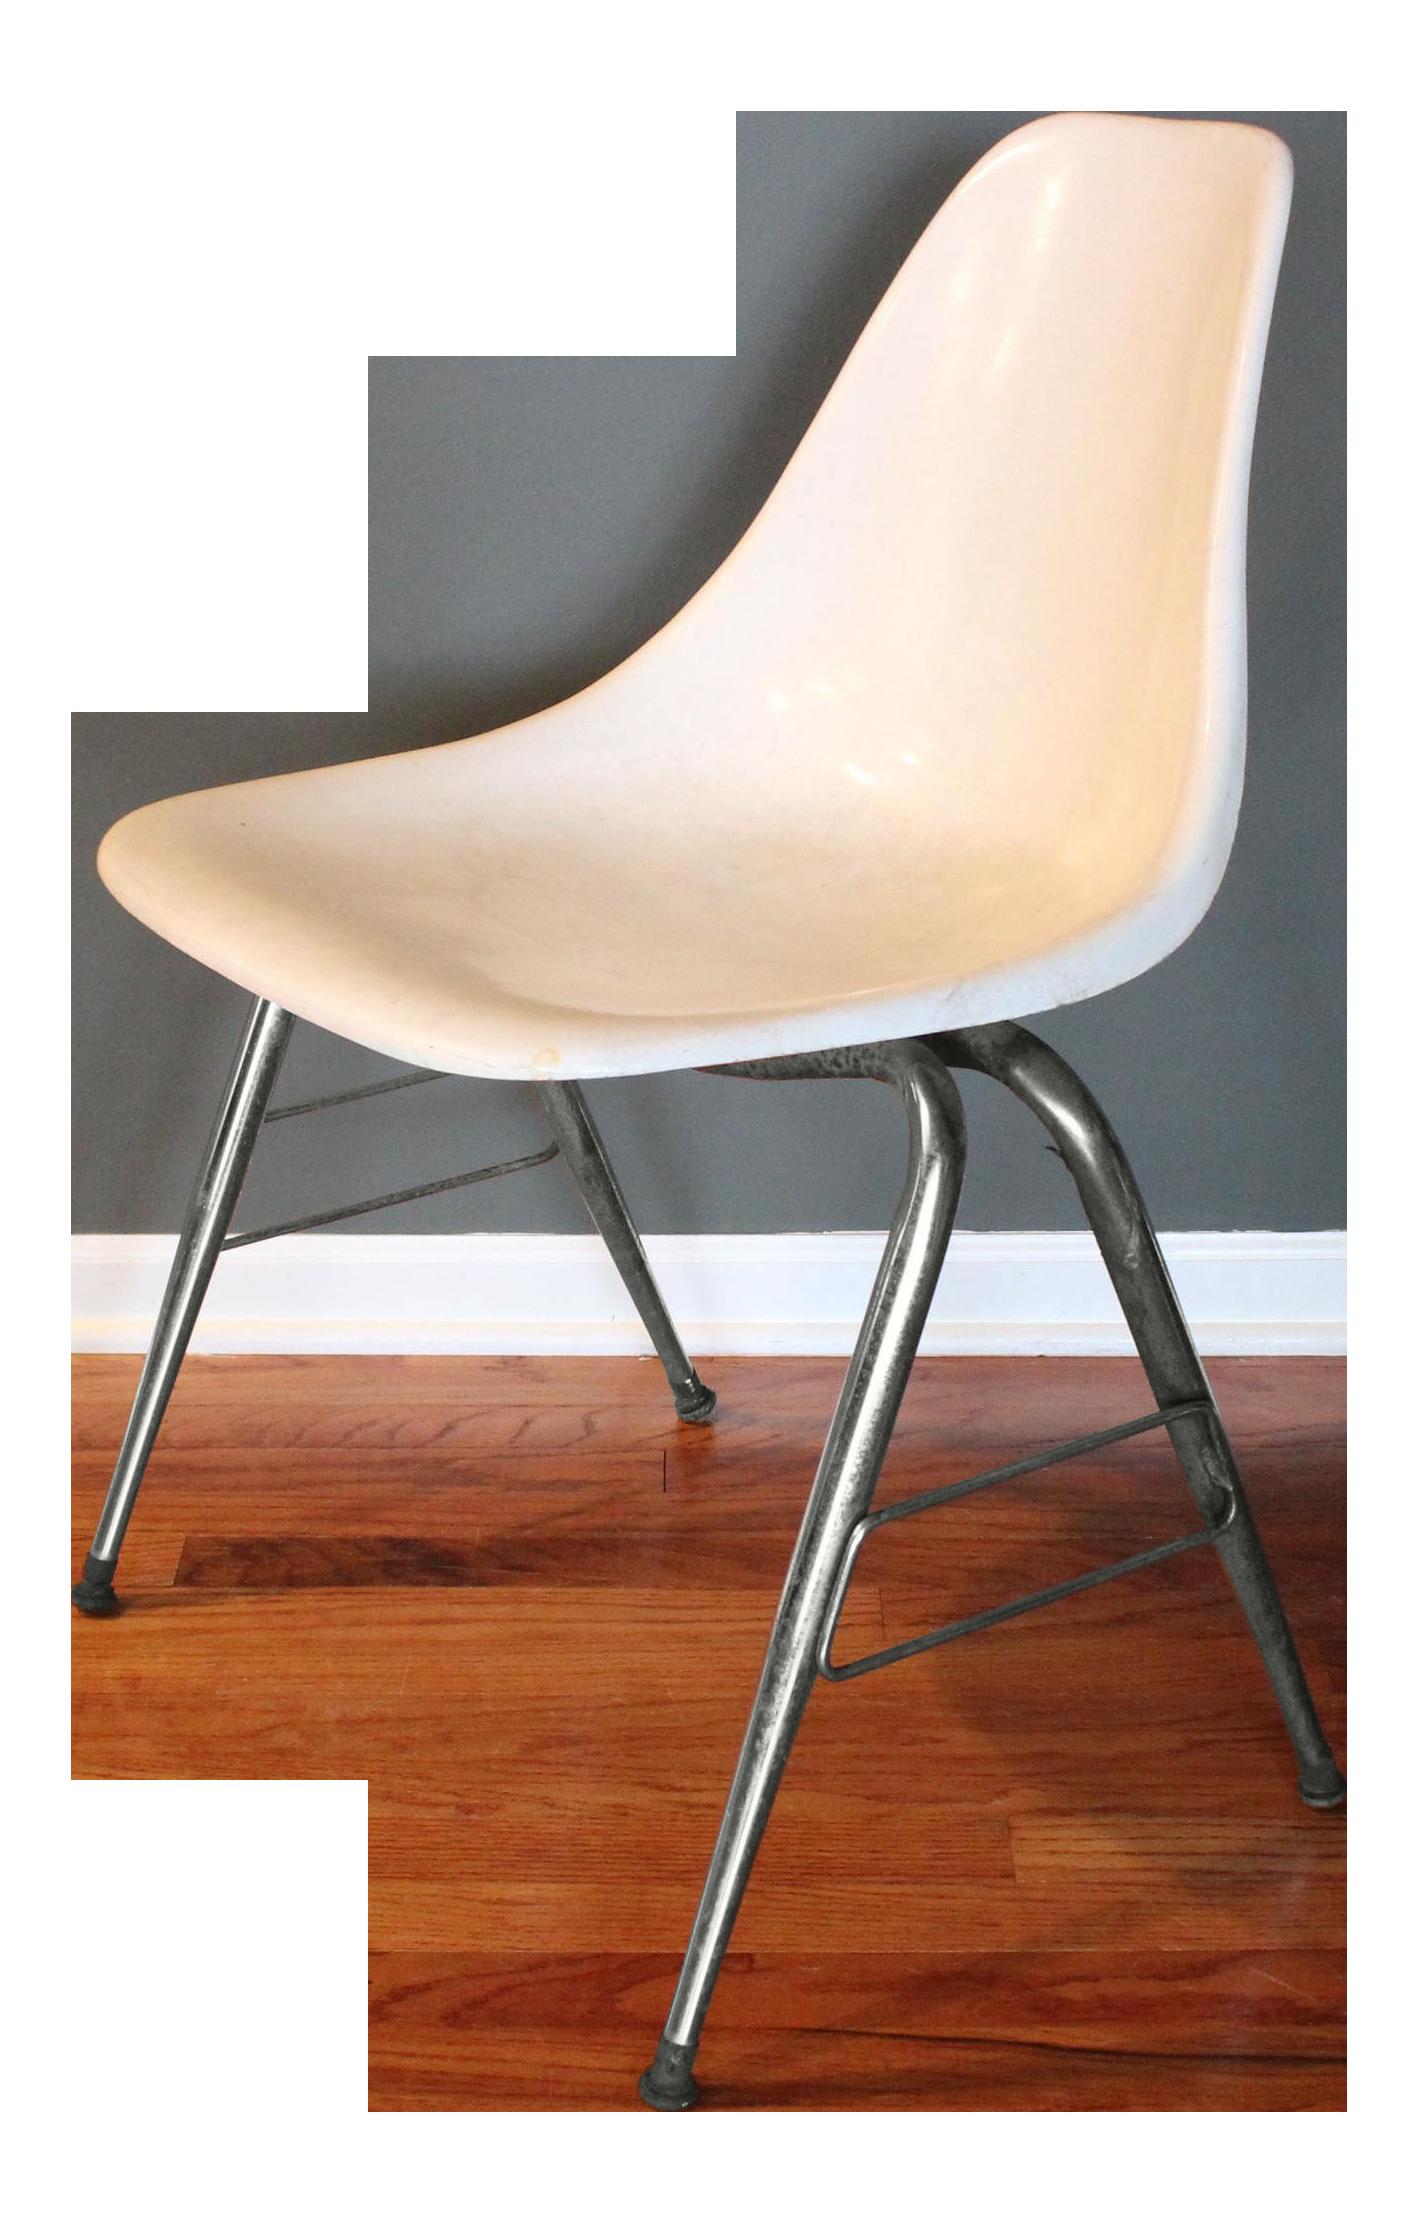 Mid Century Modern Herman Miller Eames Style White Fiberglass Chair